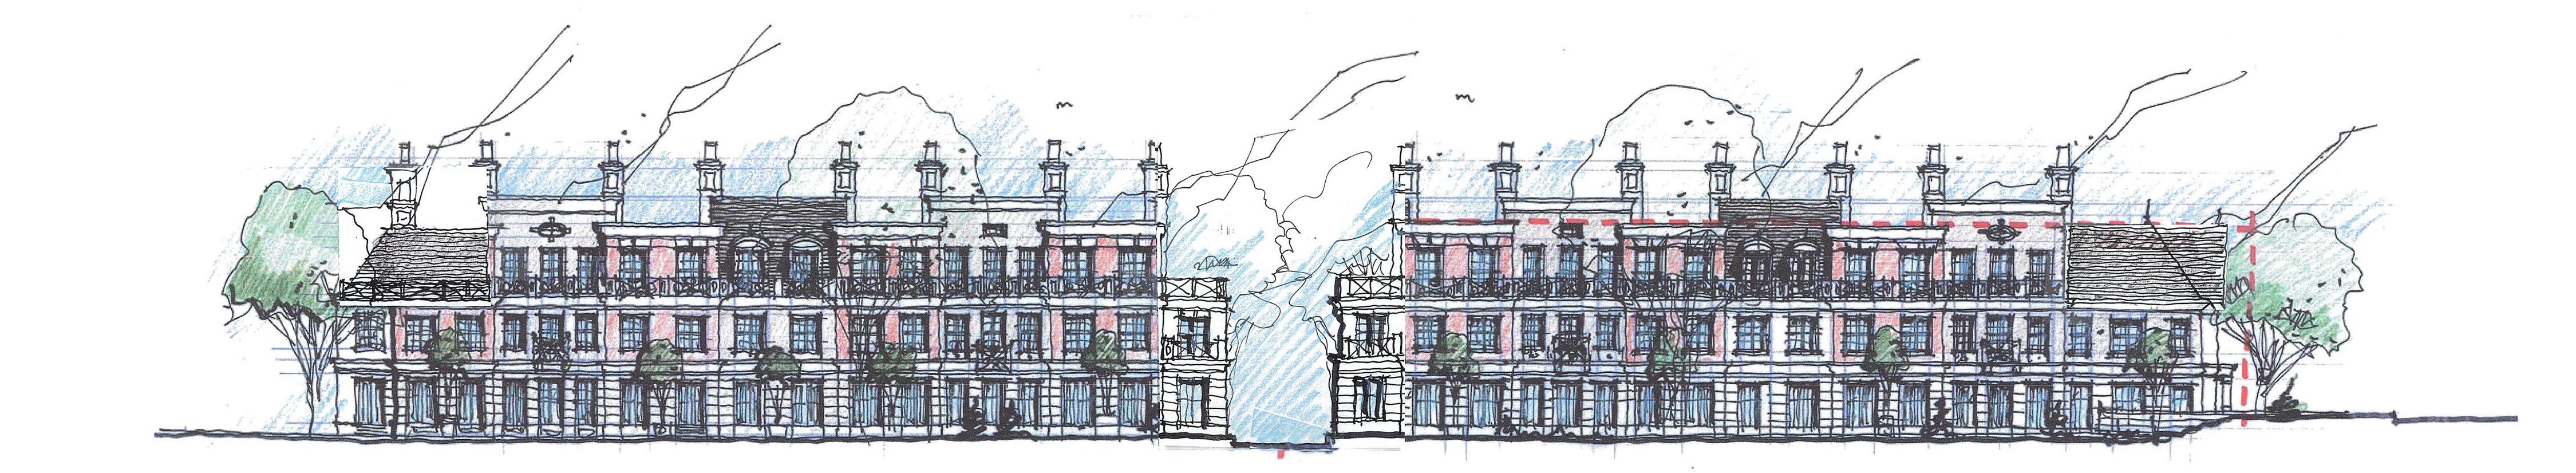 sheddon_architecture